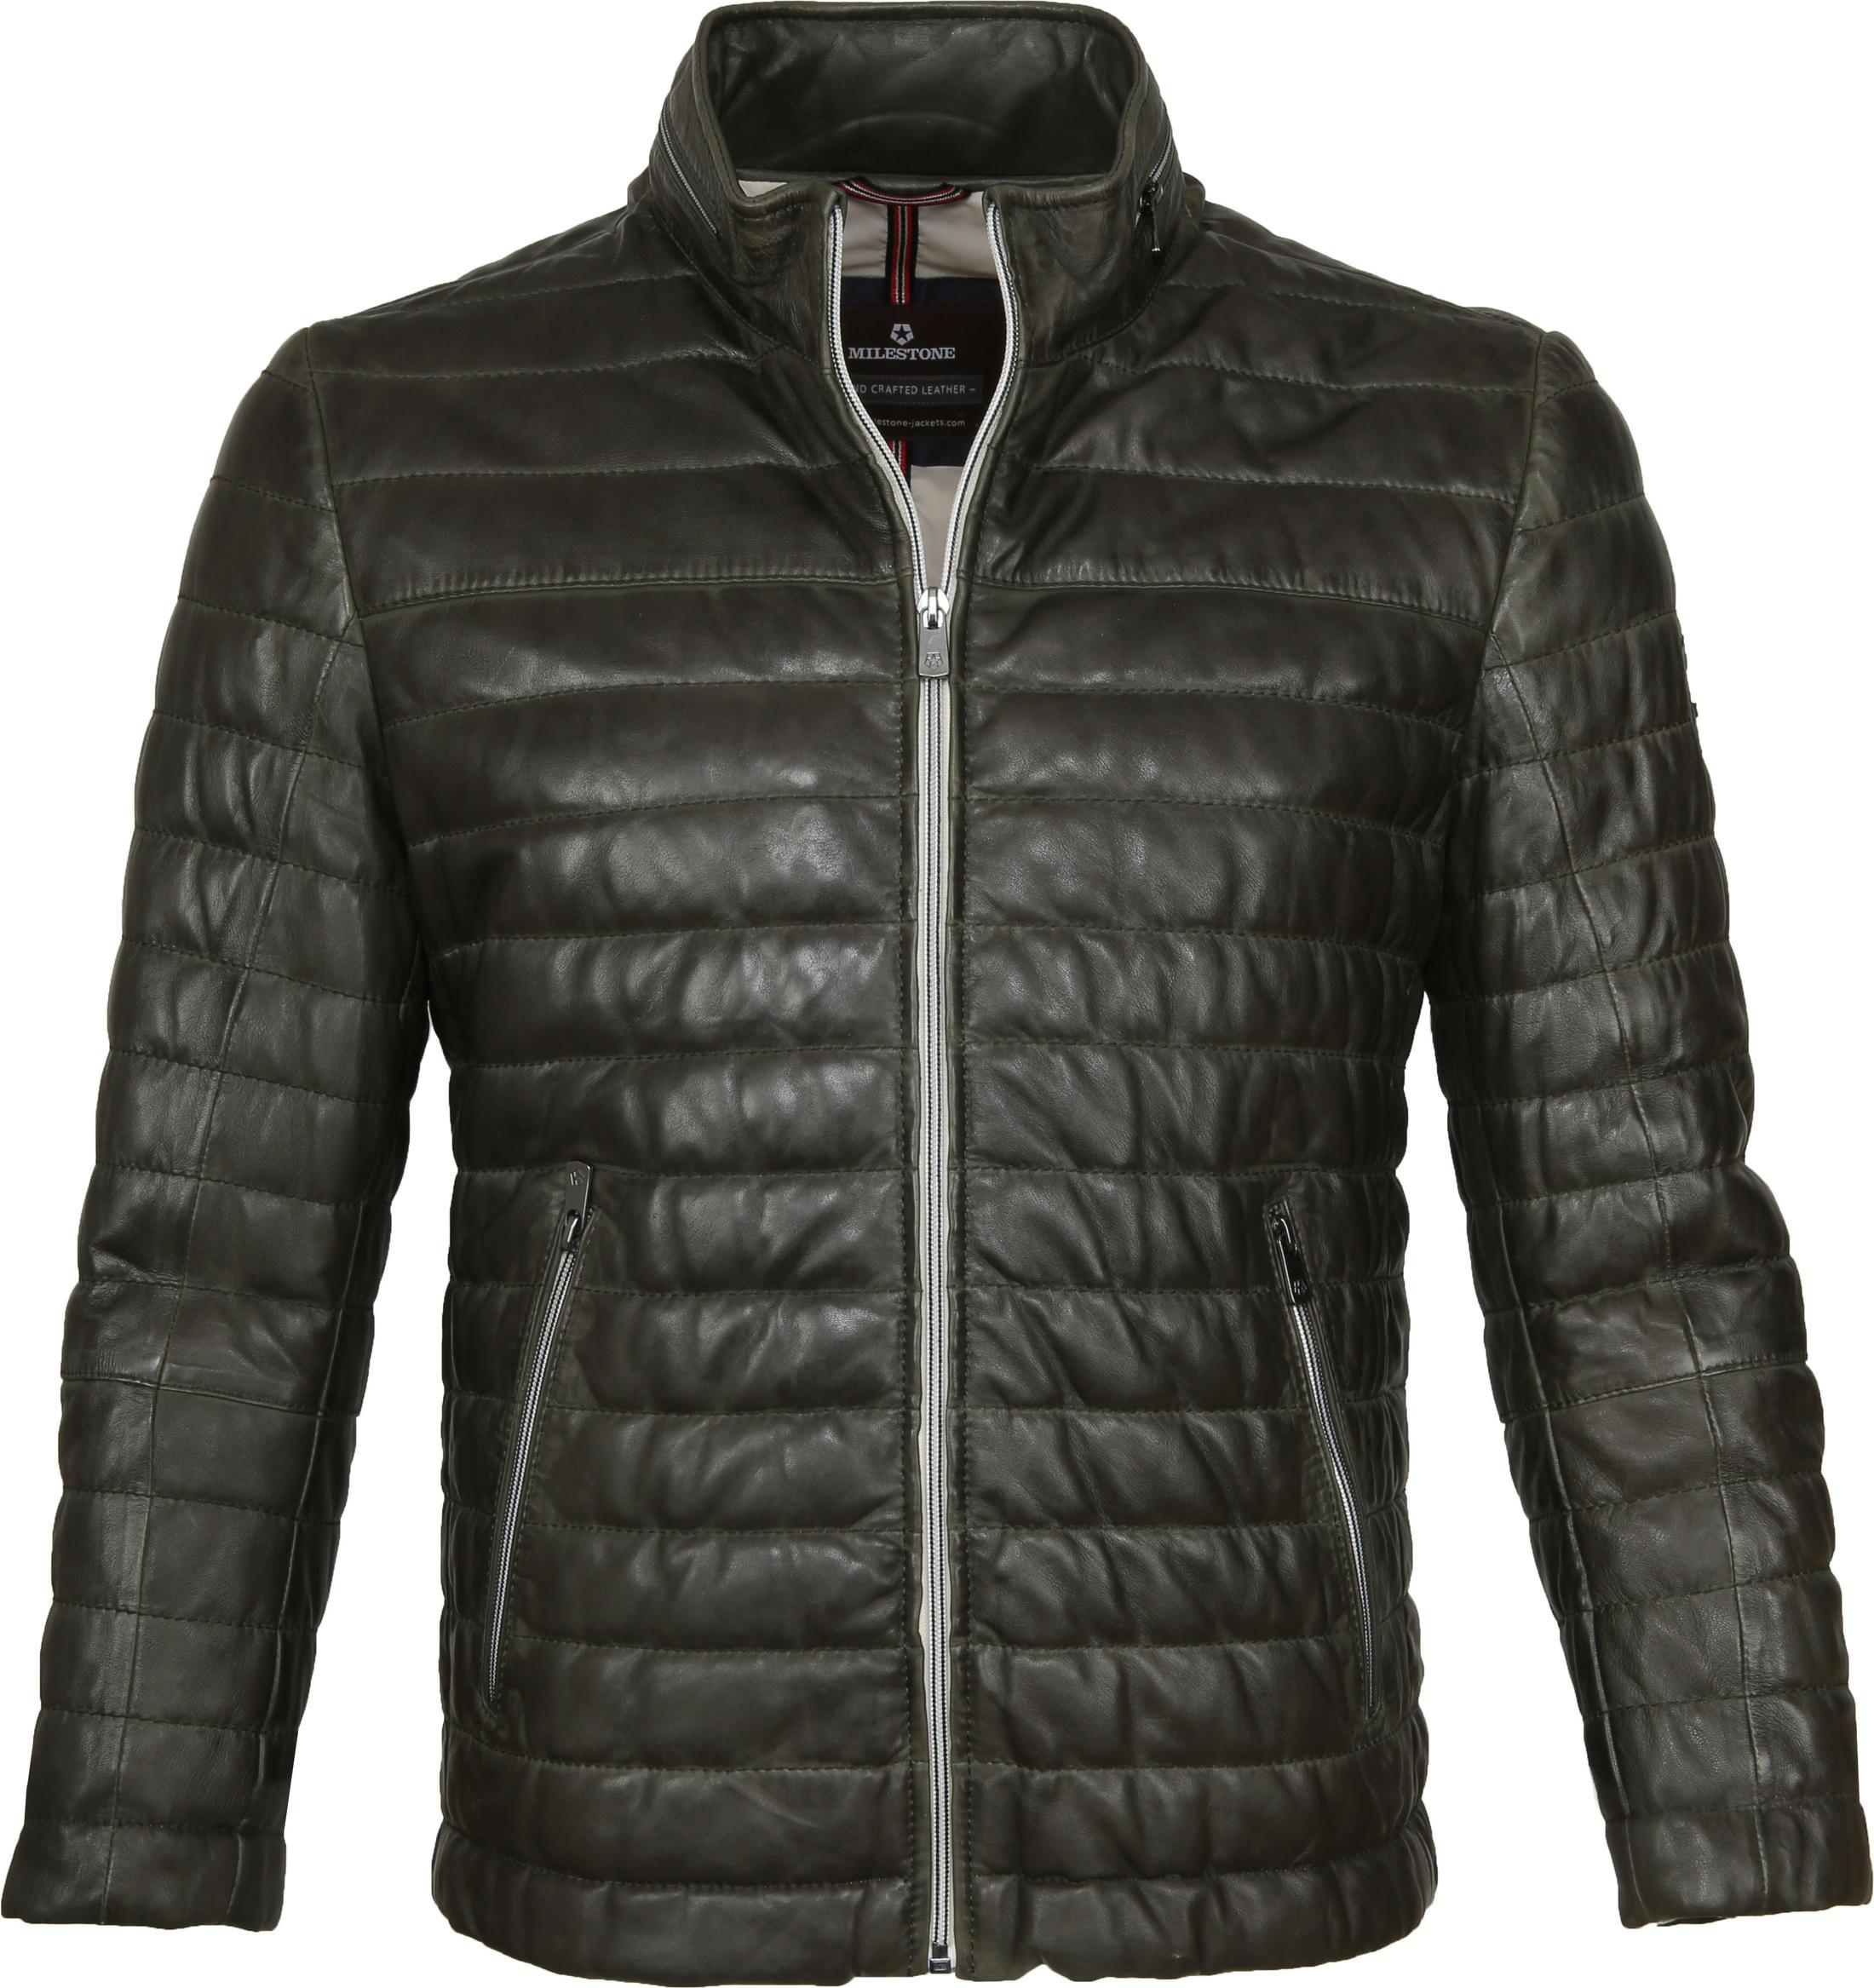 Milestone Tereno Leather Jacket Dark Green foto 0